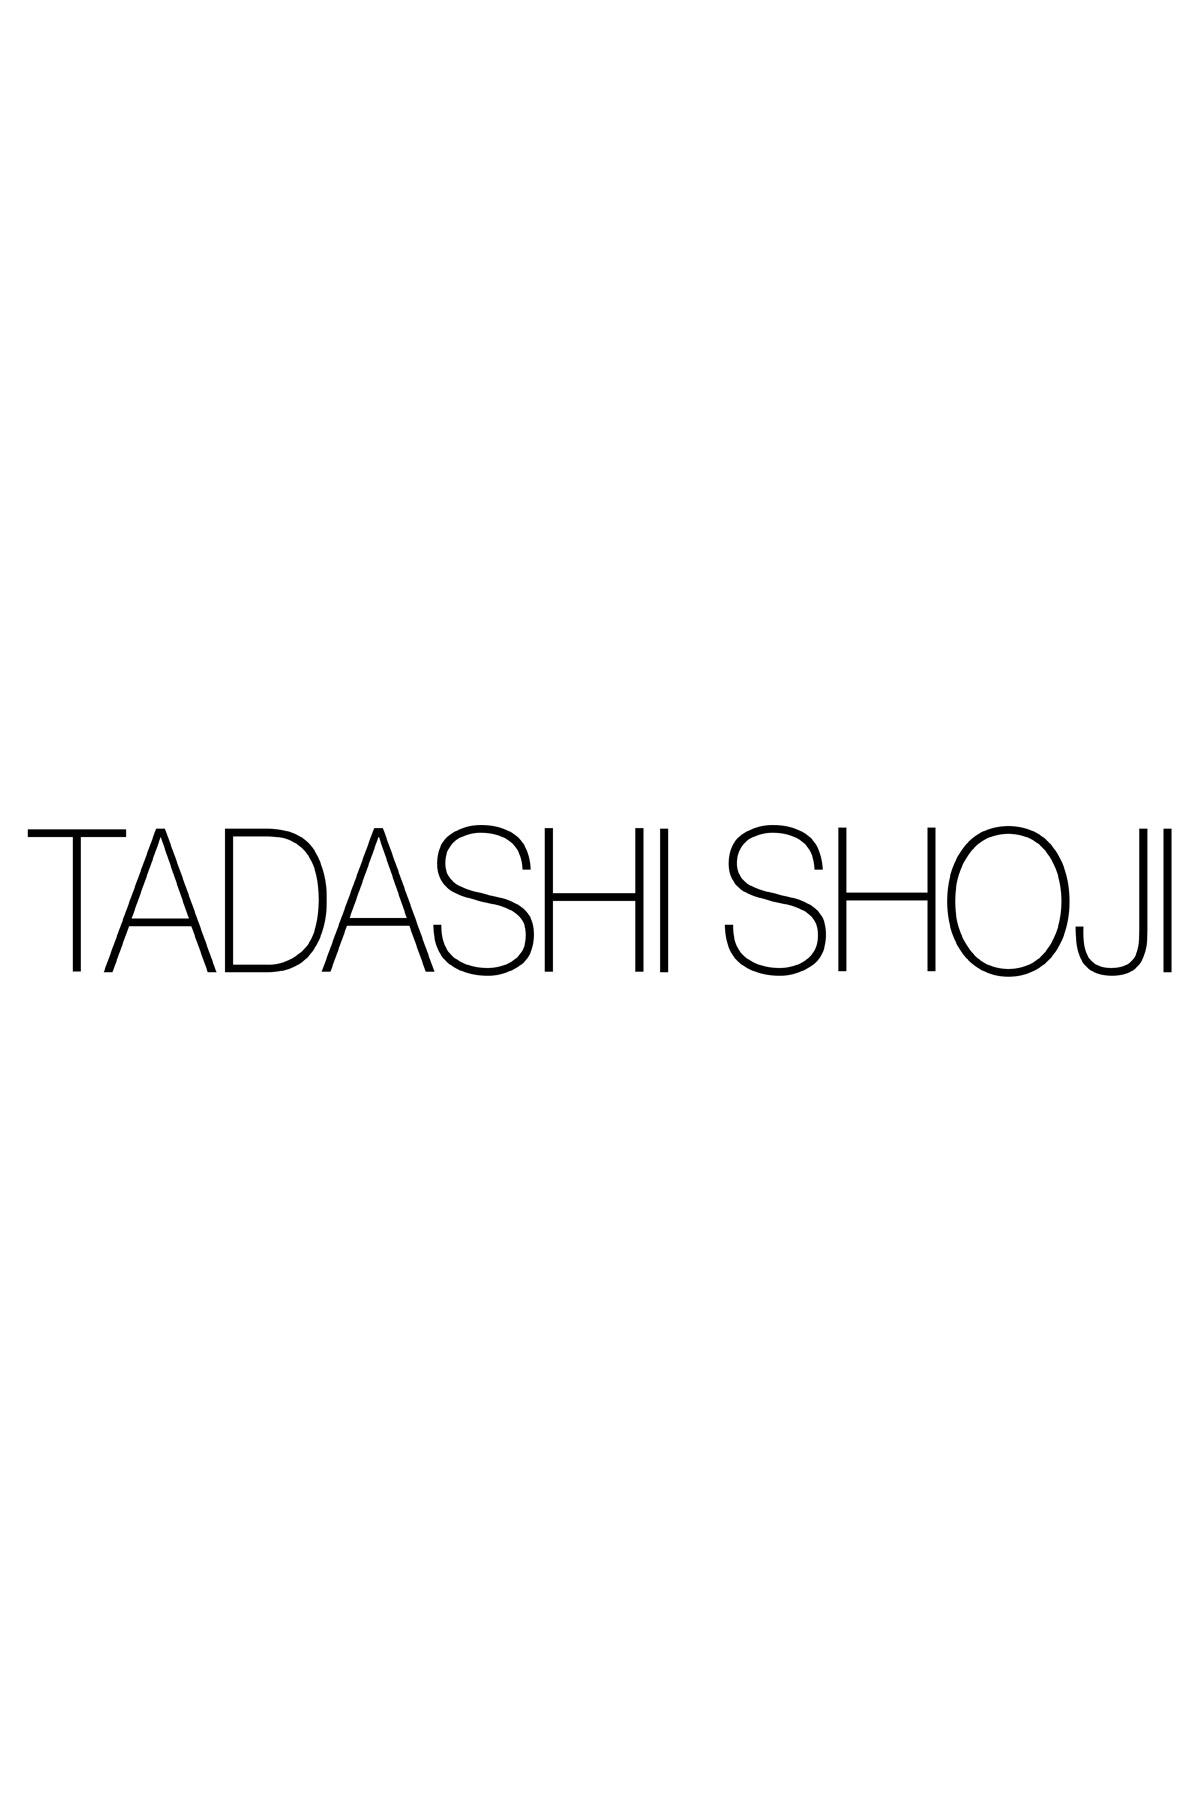 Wedding Guest Dress Codes black dress wedding guest BLACK TIE OPTIONAL Wedding guests